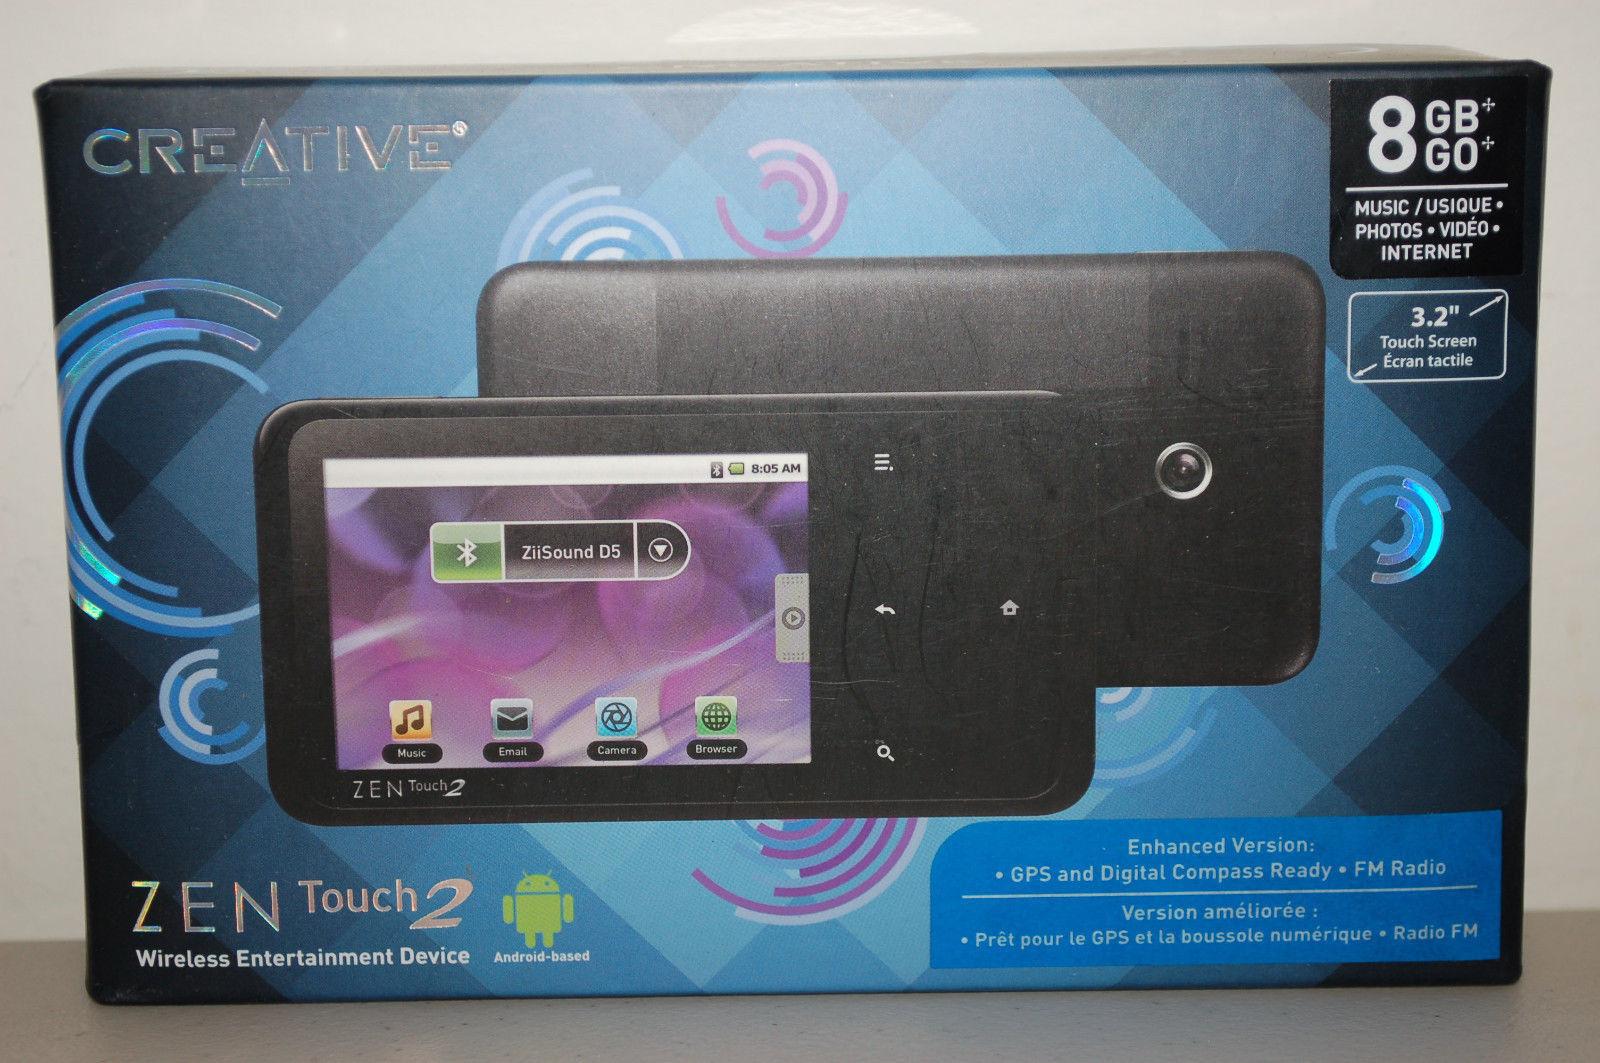 creative zen touch 2 8gb gps bluetooth wi fi and 35 similar items rh bonanza com Creative Zen MP3 Player Drivers Zen MP3 Player Problems